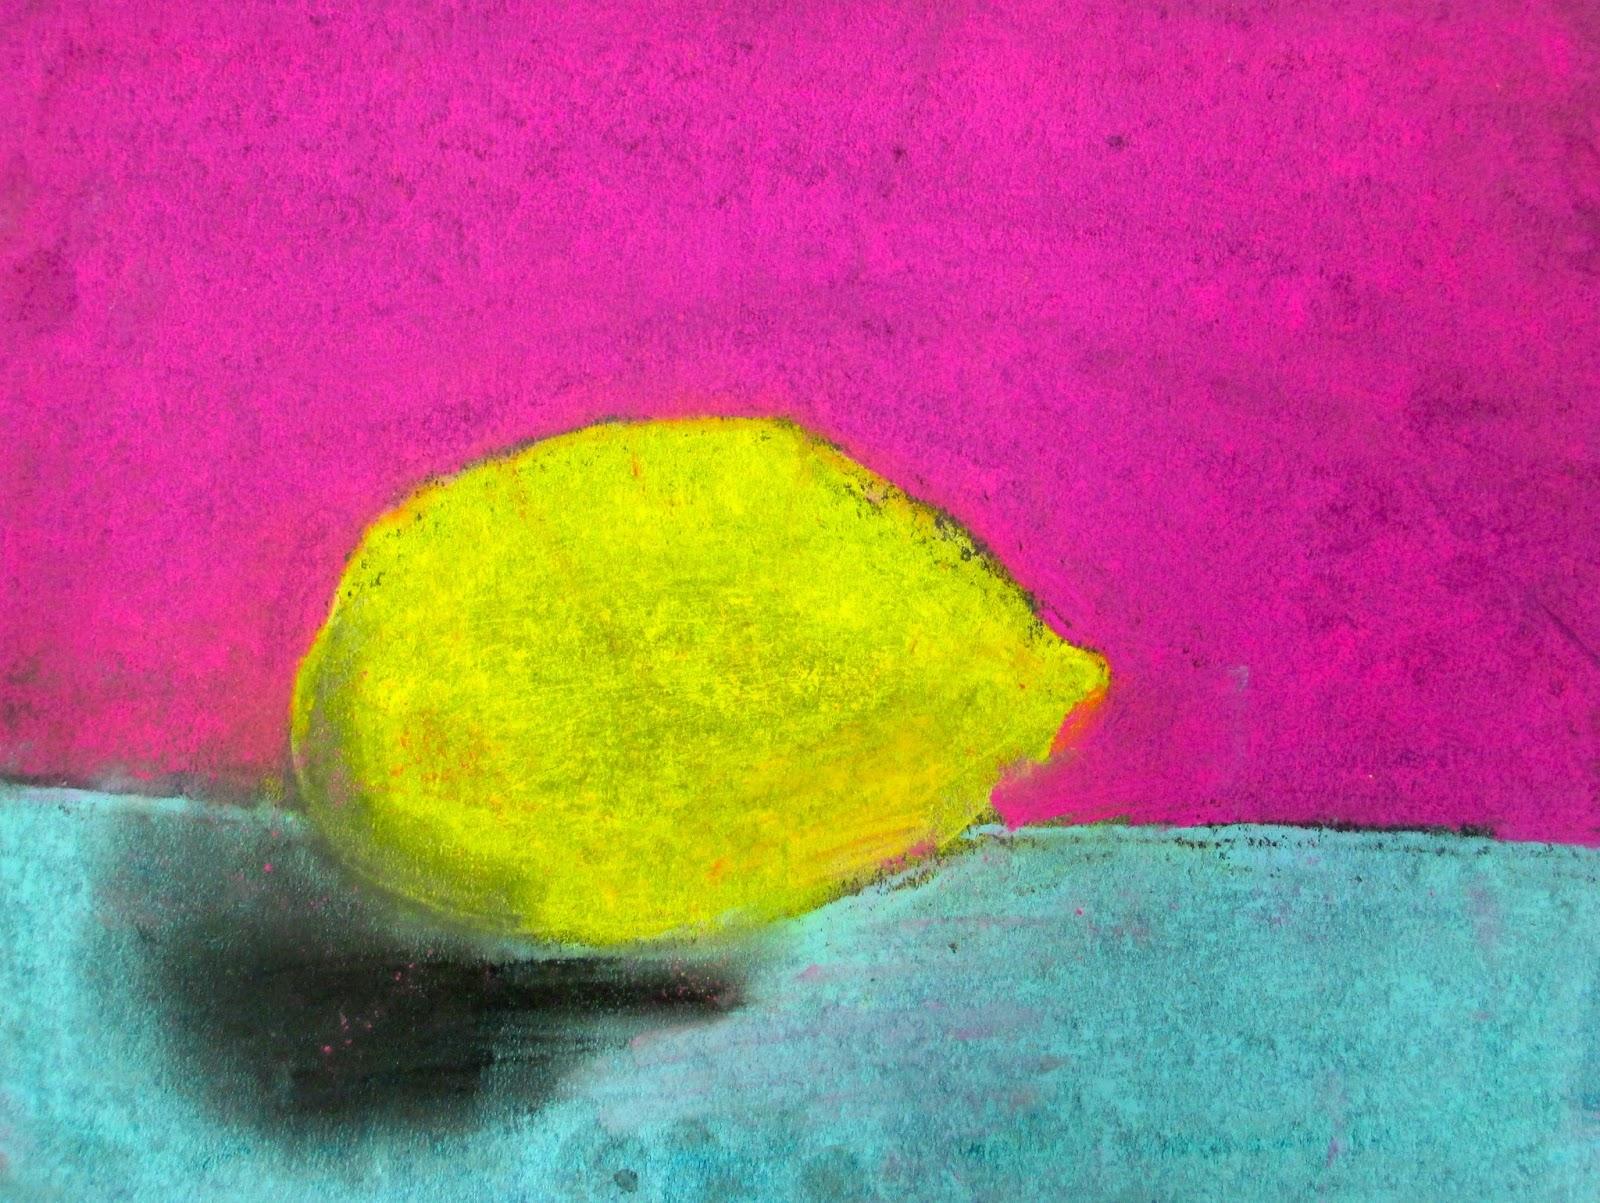 Electric Lemon.jpg